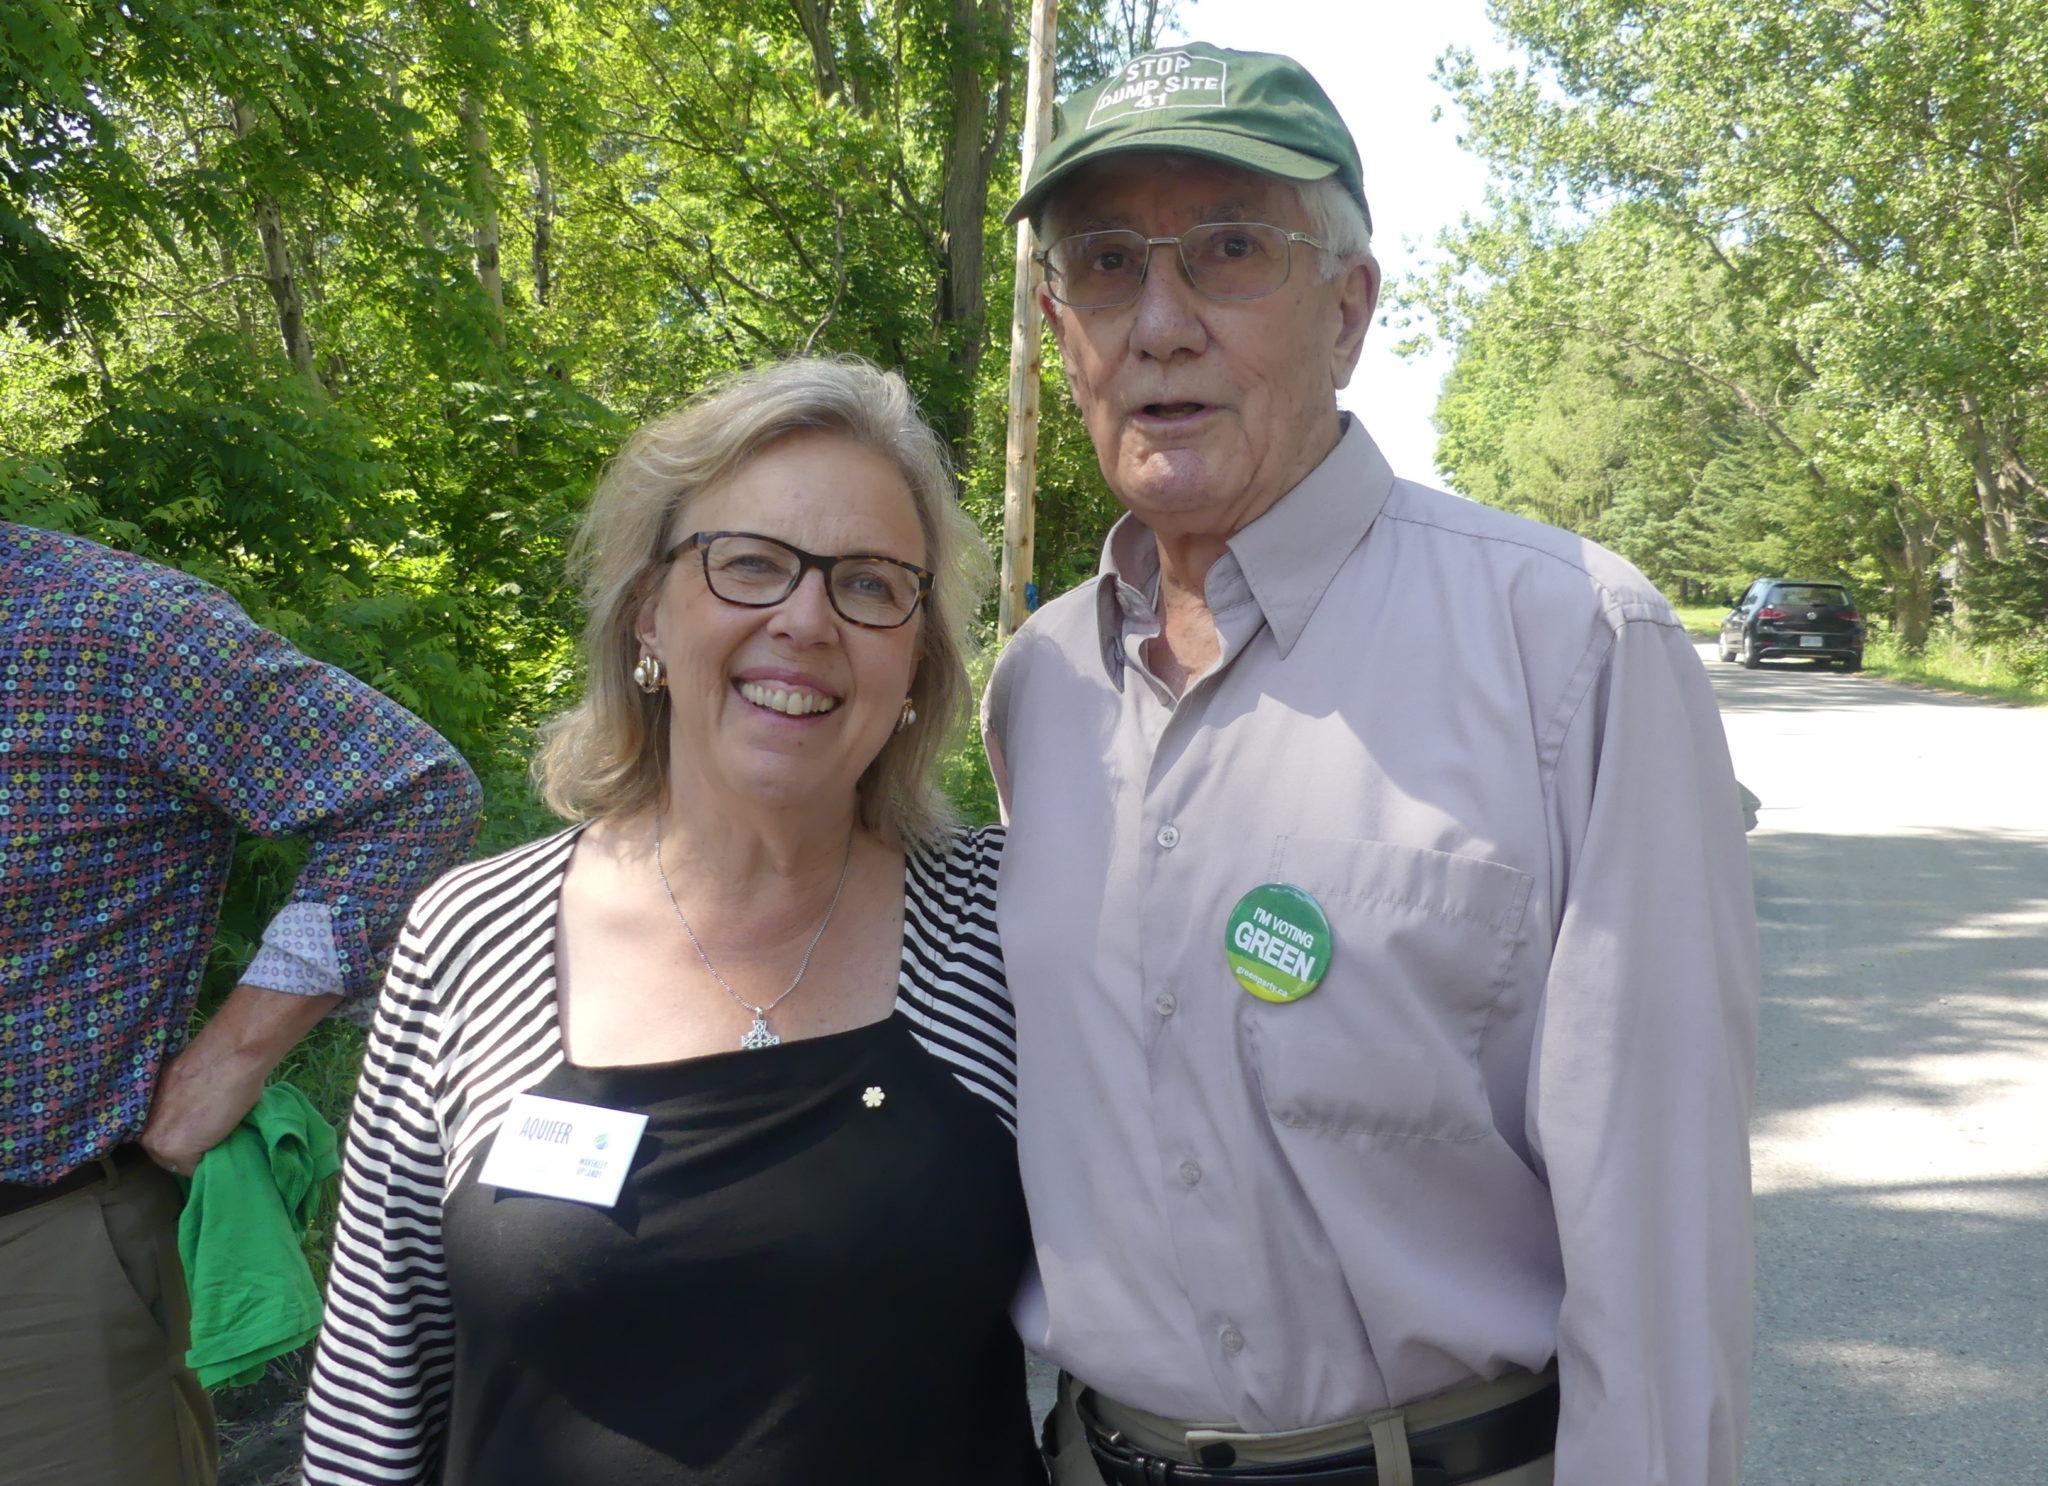 Elizabeth May and Don Morgan